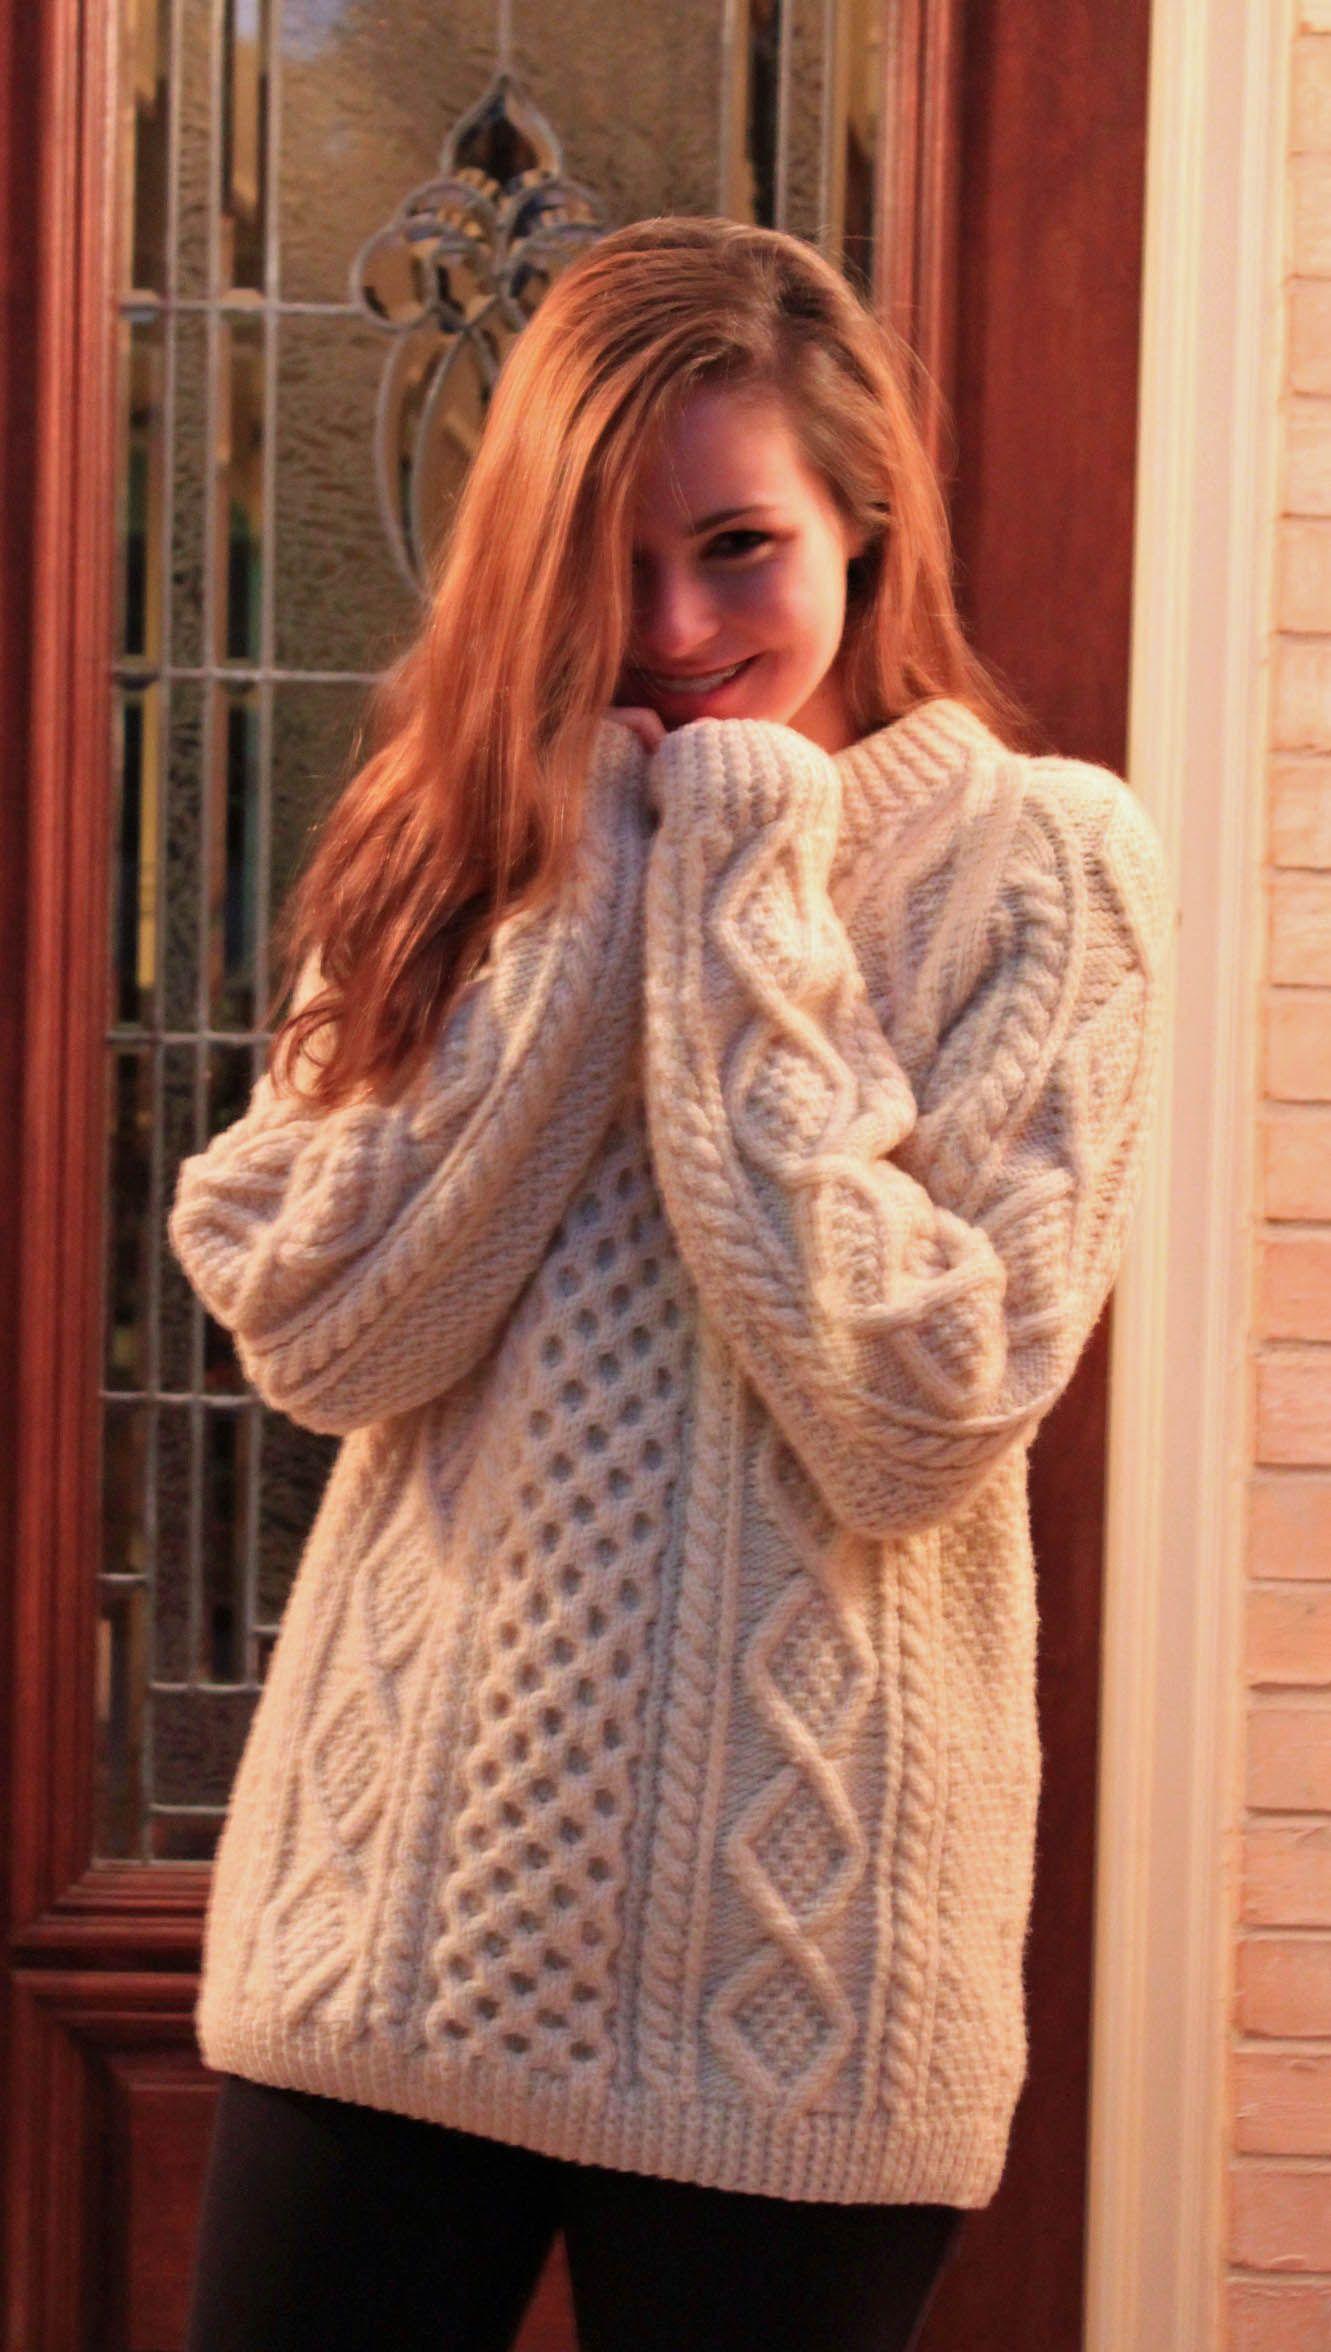 8661f5b1b Cozy Hand Knit Irish Fishermans Sweater at The Woodlands Goodwill Thrift  Store